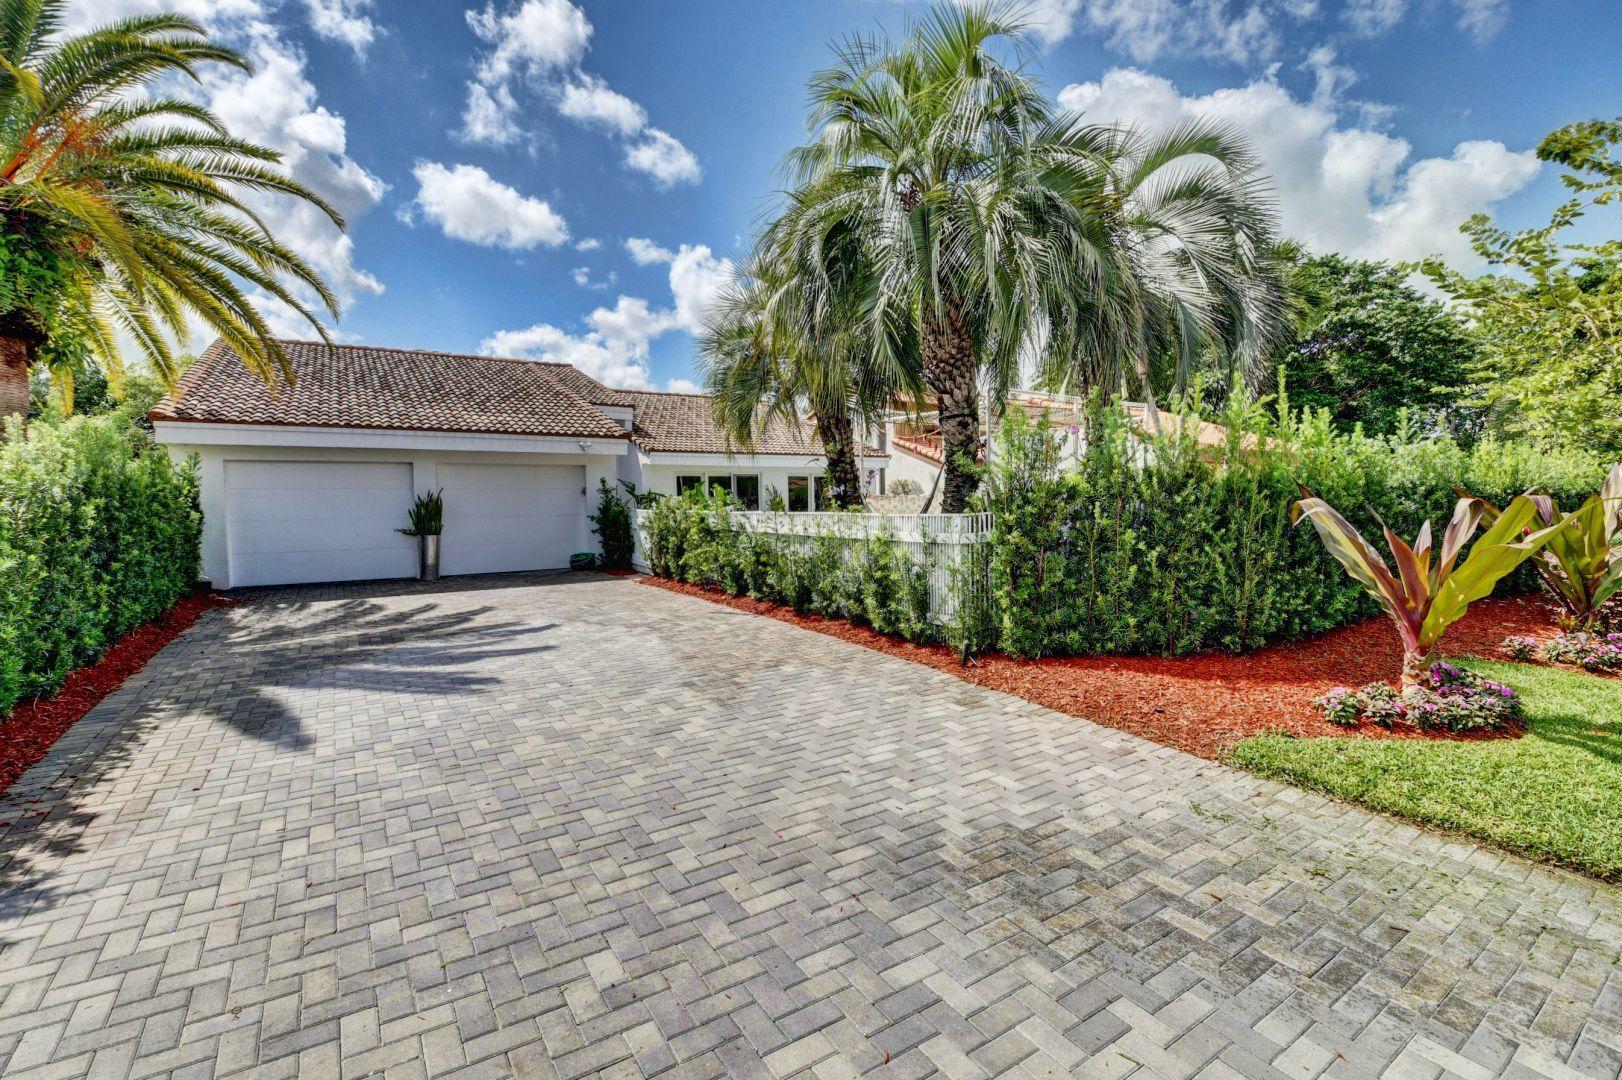 Photo of 7696 Cedarwood Circle, Boca Raton, FL 33434